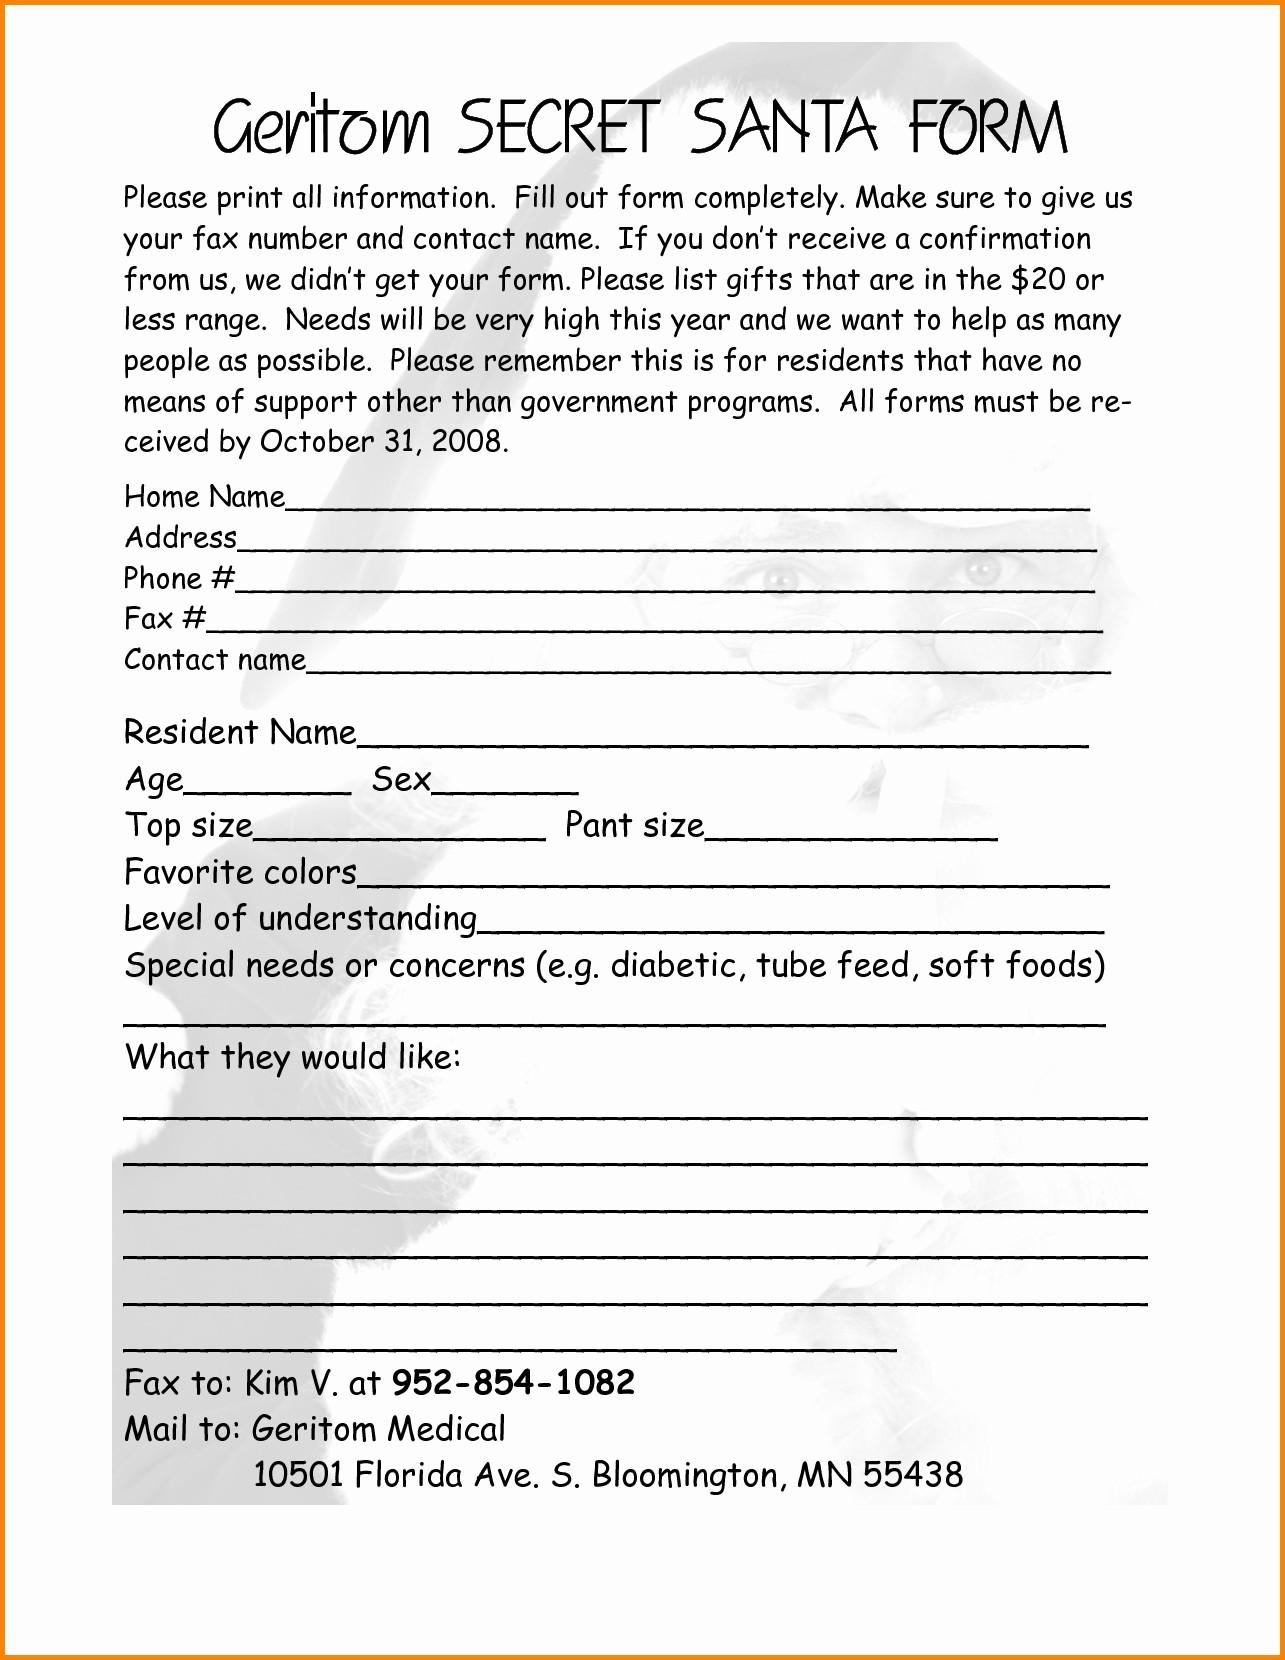 Secret Santa Gift Exchange Template Beautiful Secret Santa Gift Exchange forms Questionnaire with Regard